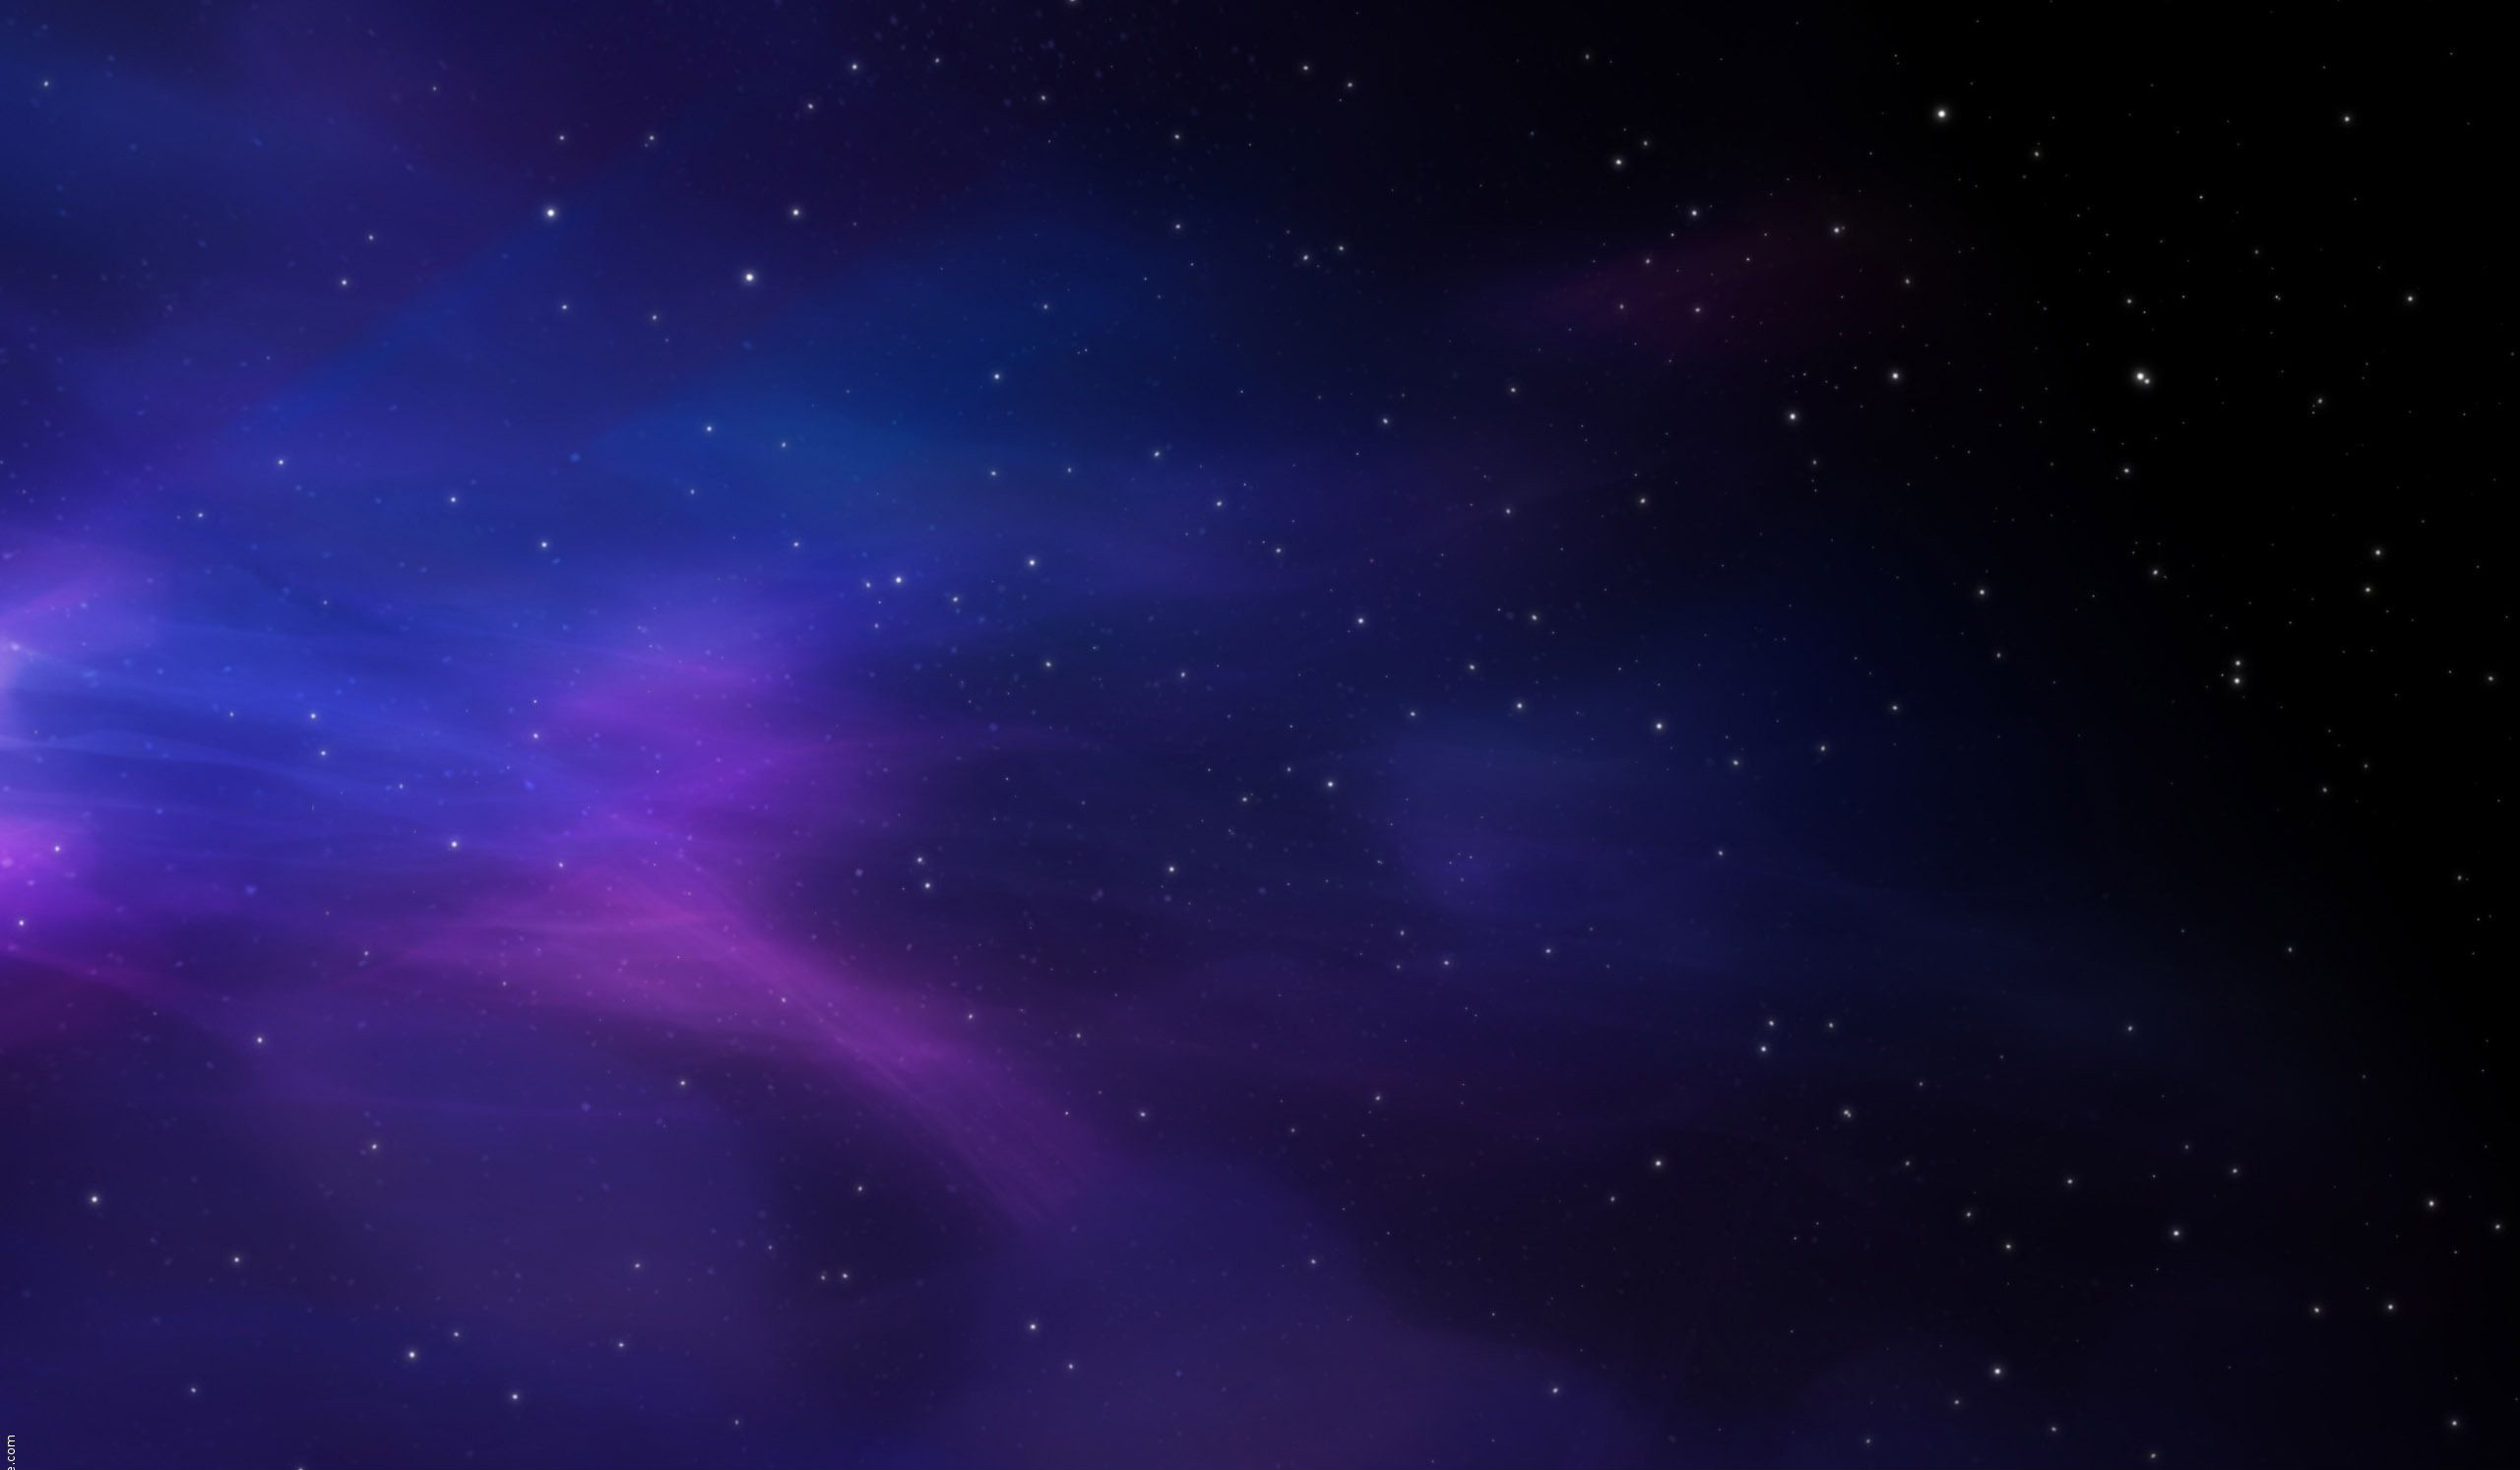 Galaxy background tumblr gif